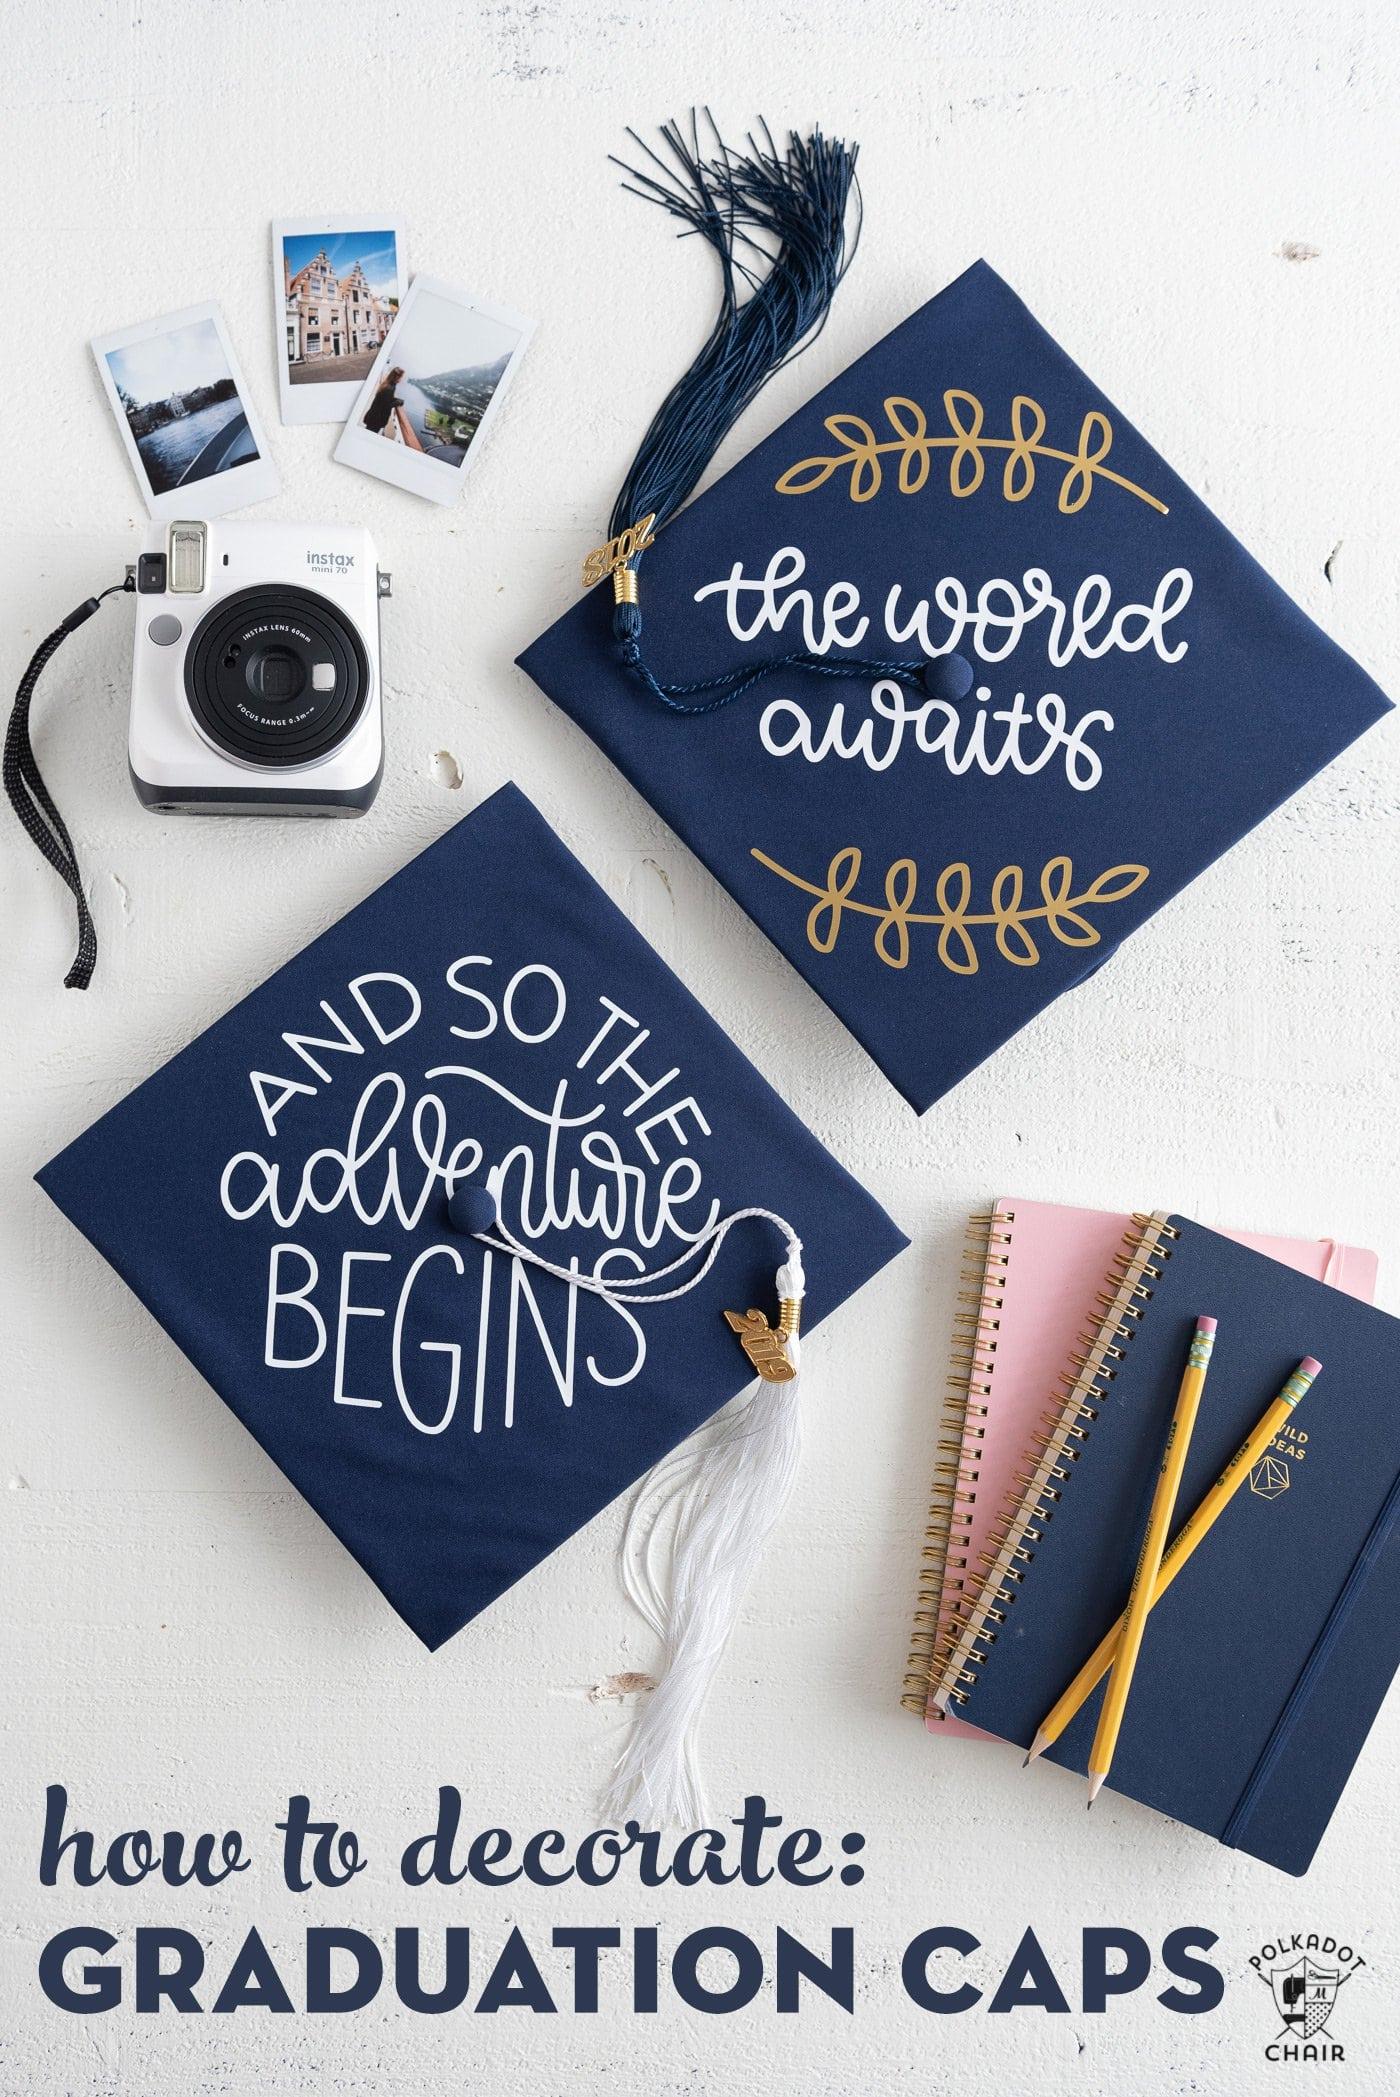 Diy Graduation Cap Decorating Ideas Using Cricut Iron-On | The Polka with Blank Graduation Advice Sheets